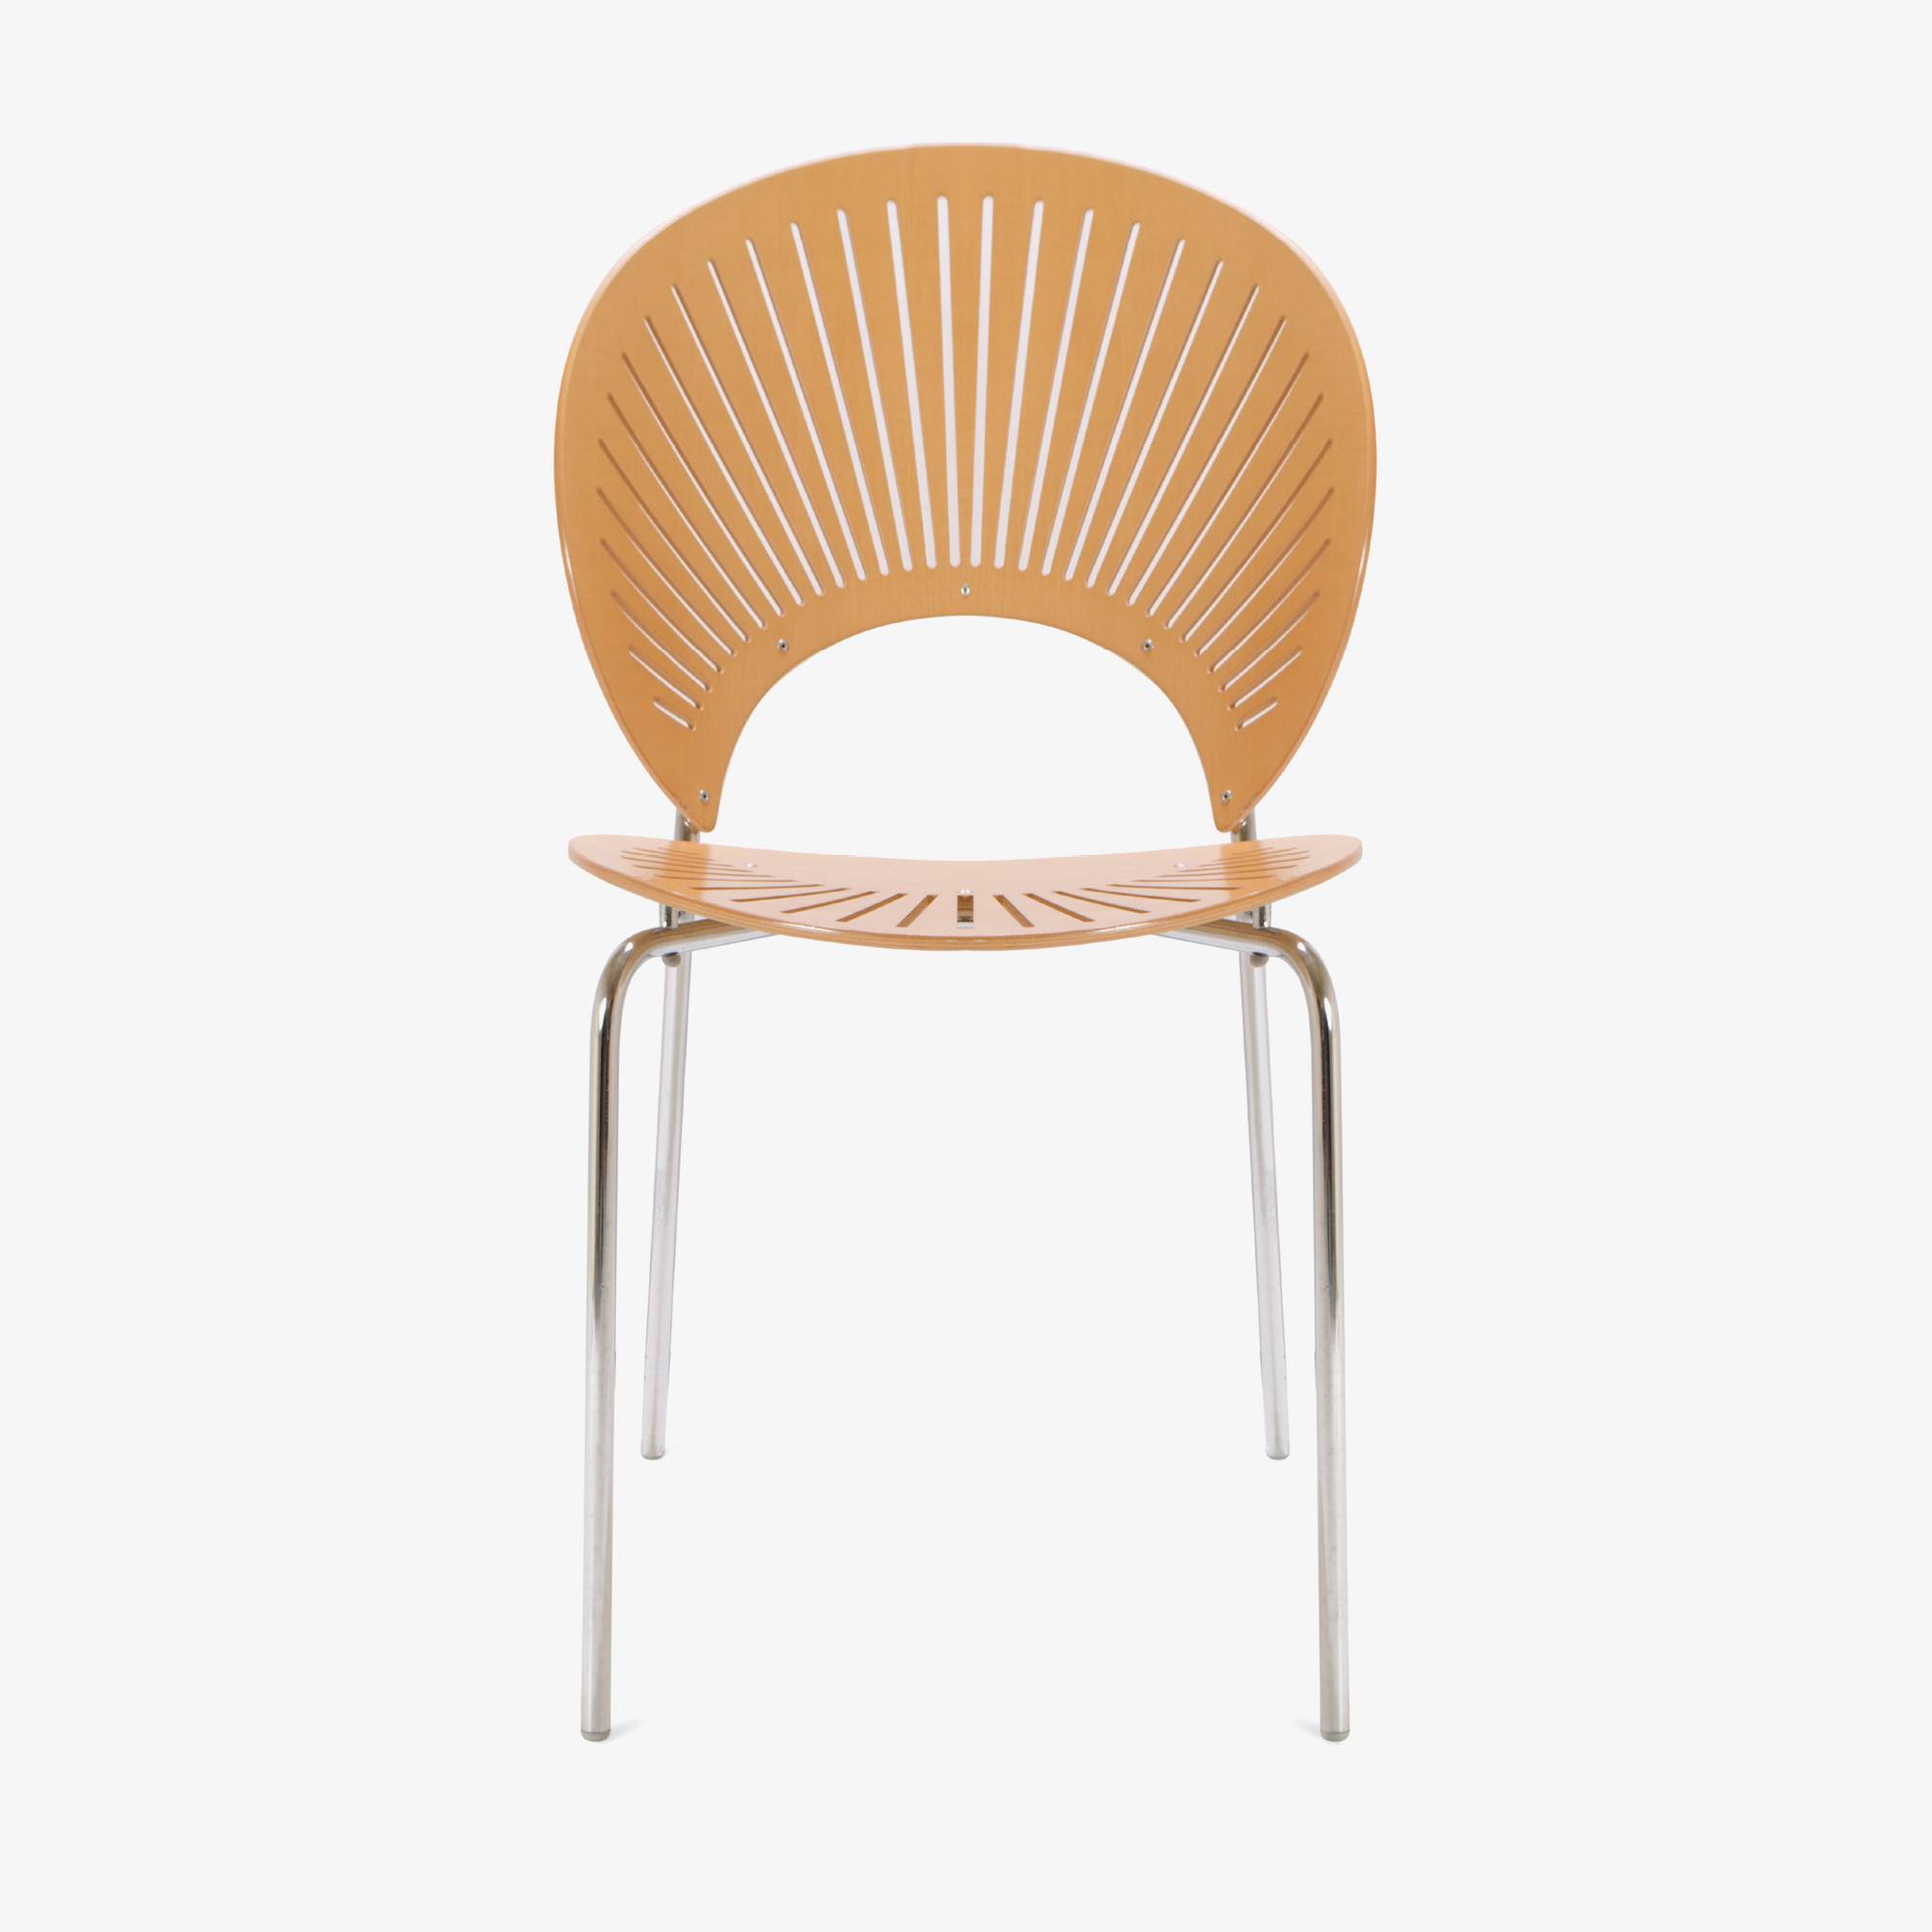 Trinidad Chairs by Nanna Ditzel2.png